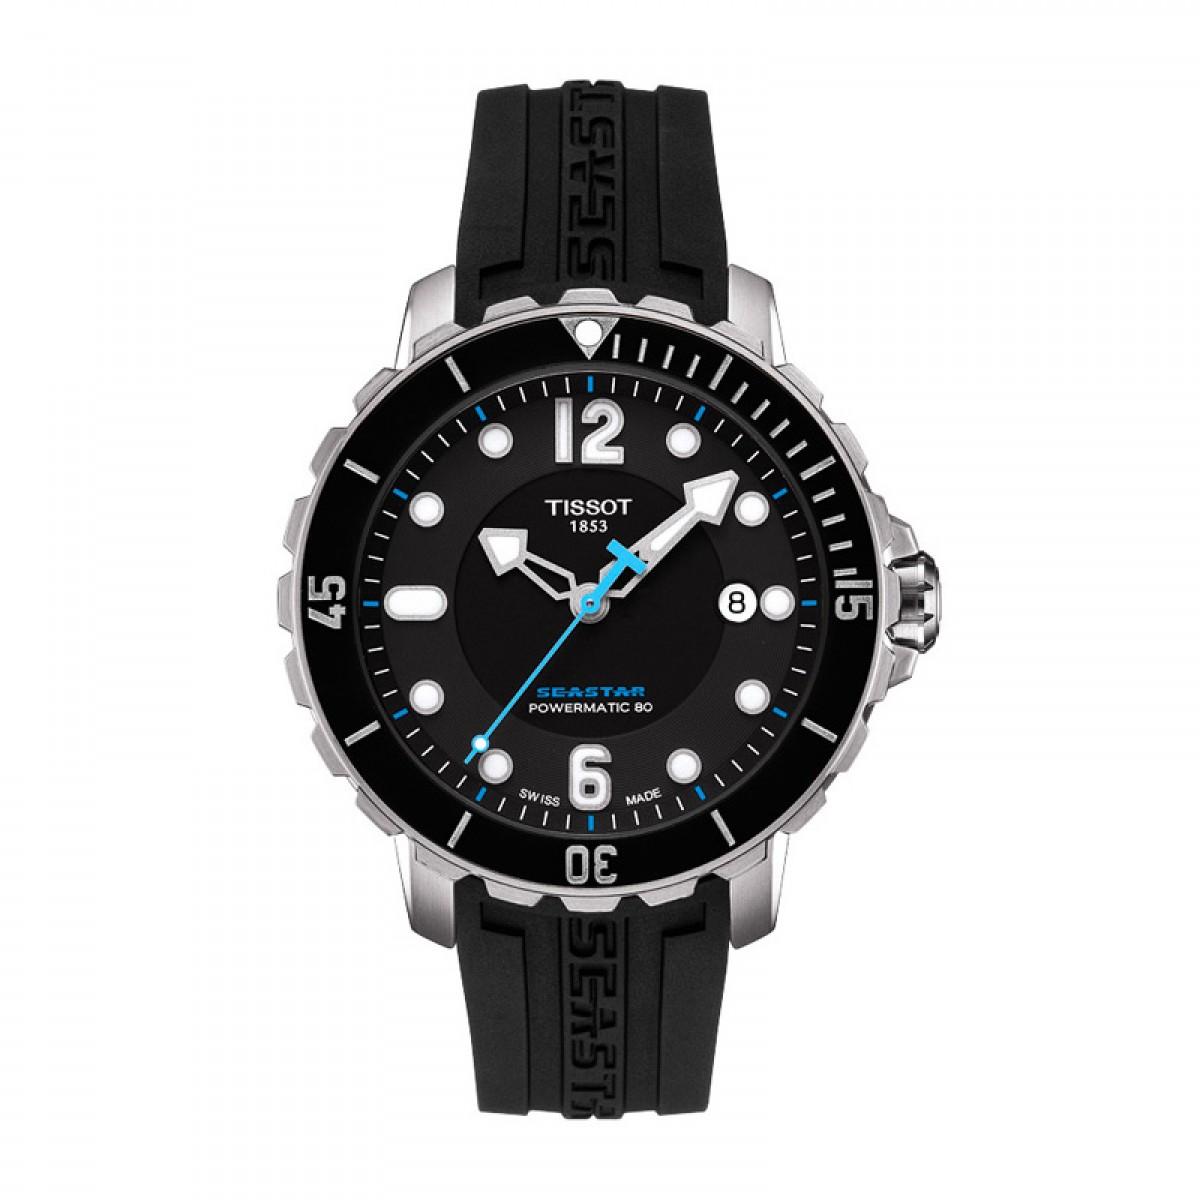 Часовник Tissot T066.407.17.057.02